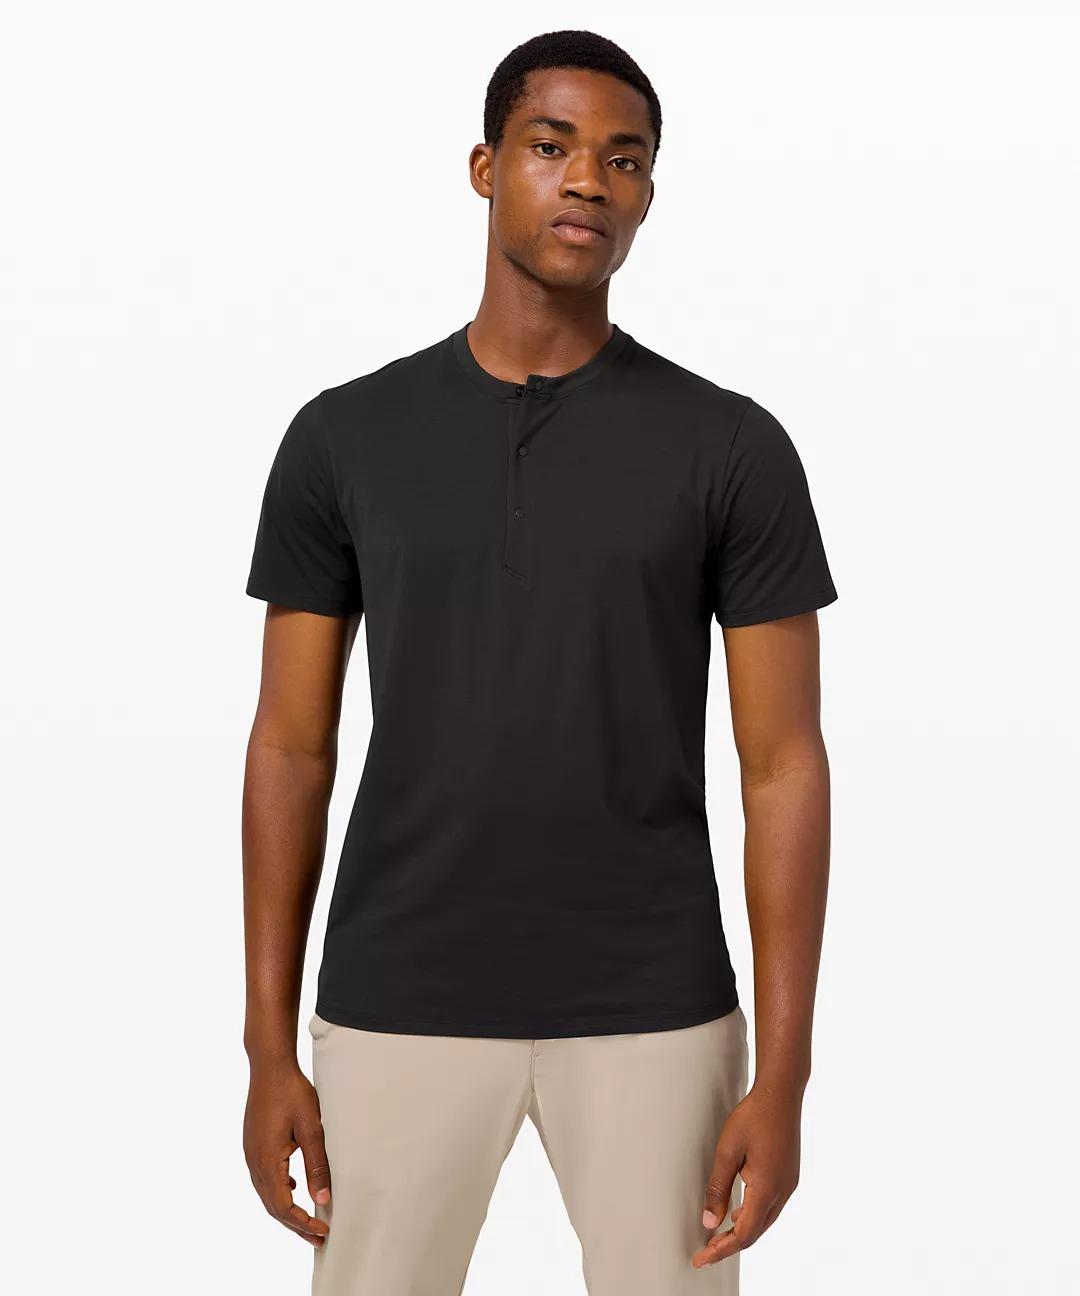 Man wears Lululemon The Fundamental Short-Sleeve Henley shirt in black